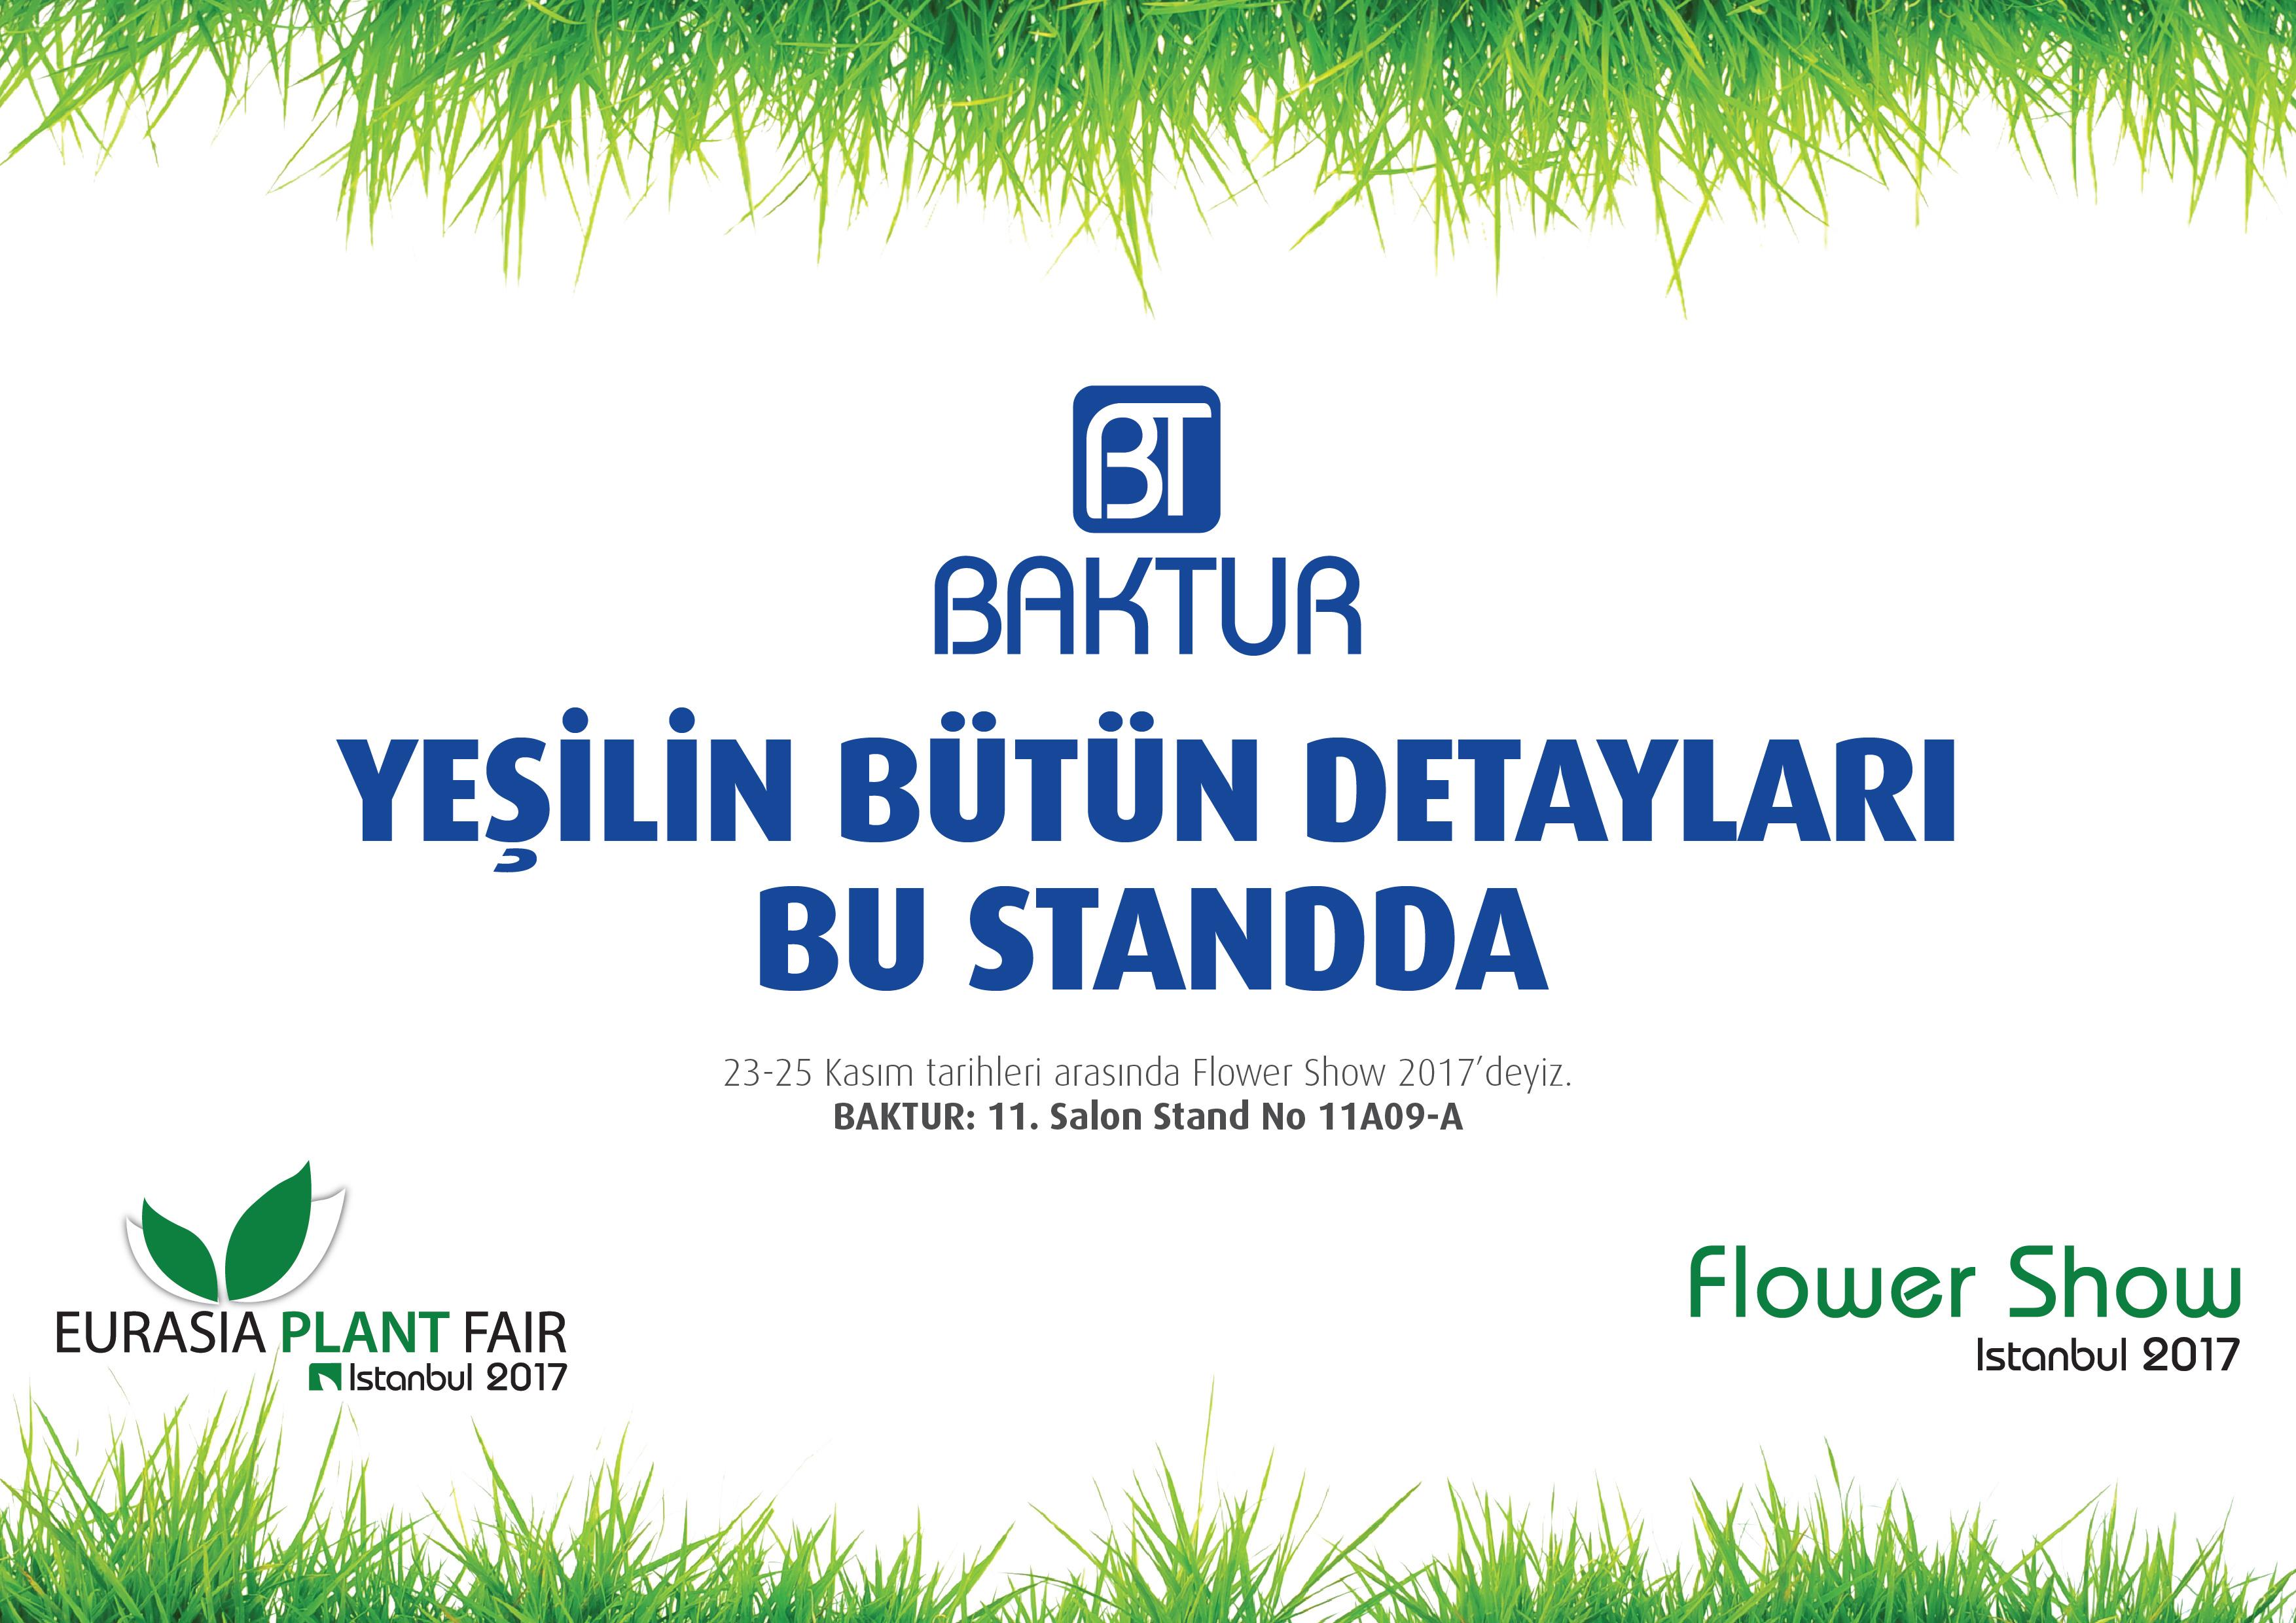 Flower Show Istanbul 2017 Fuar Davetiyesi